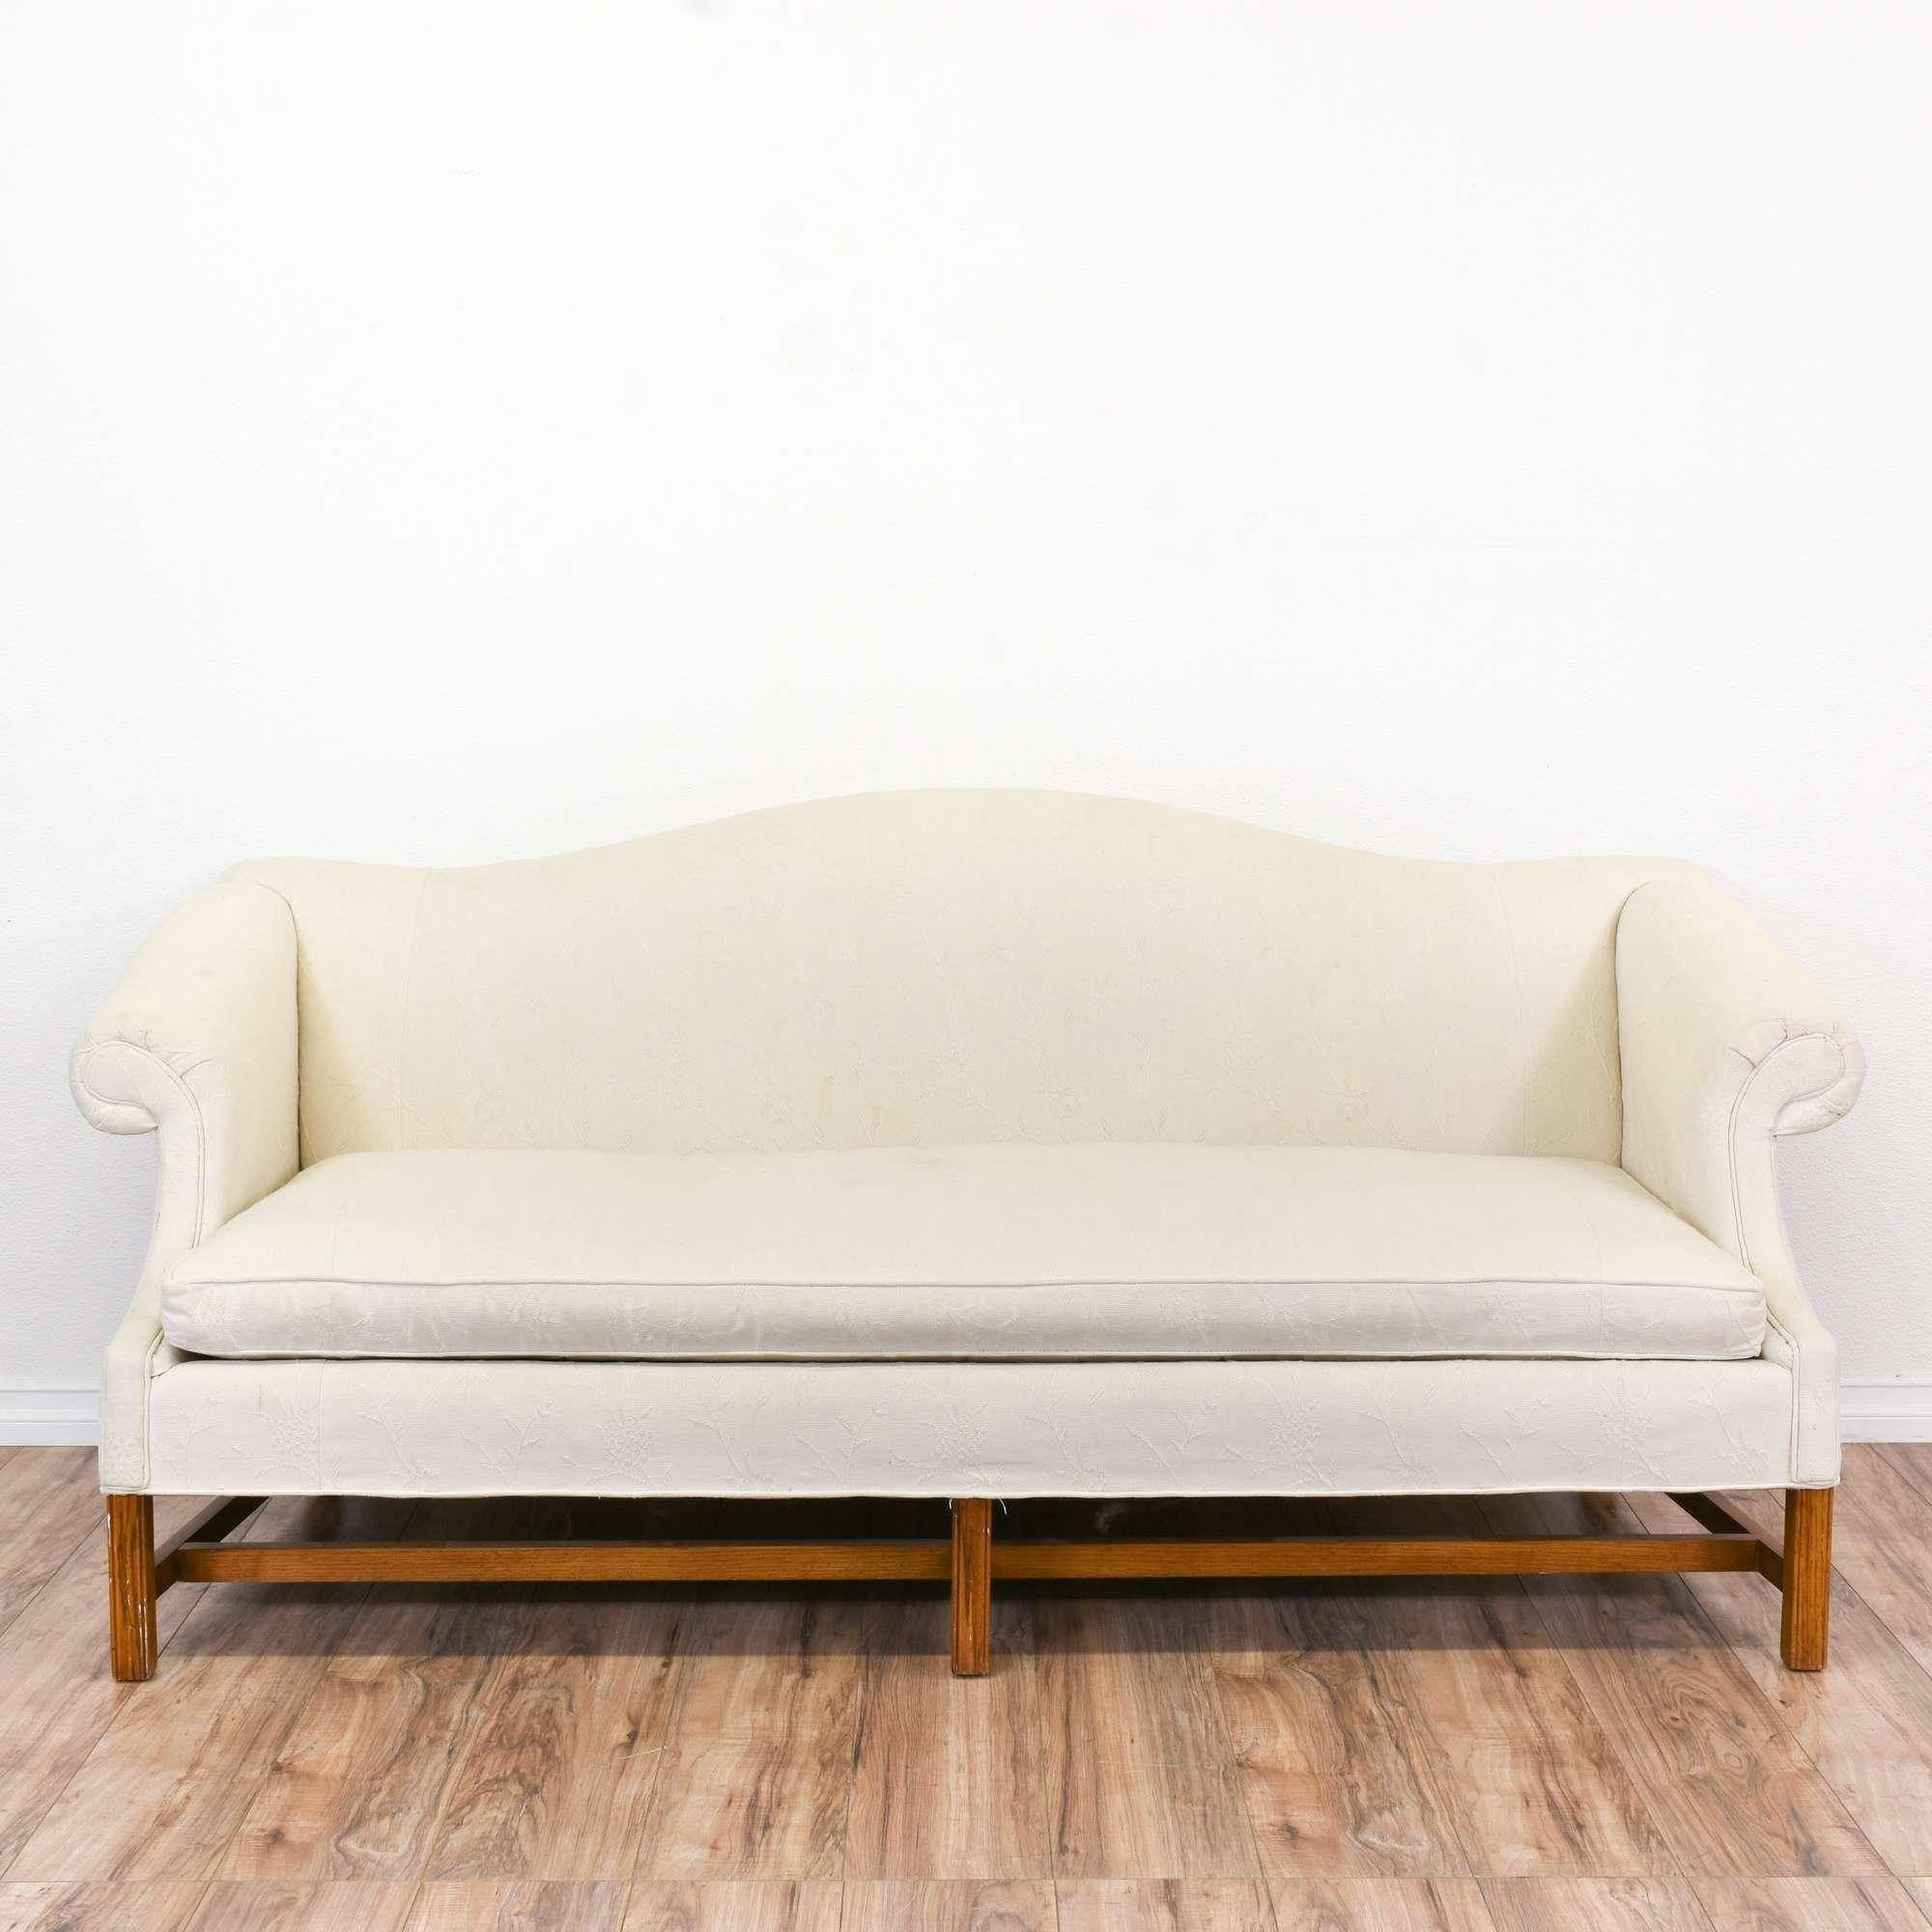 Contemporary Chippendale Camelback Sofa in White